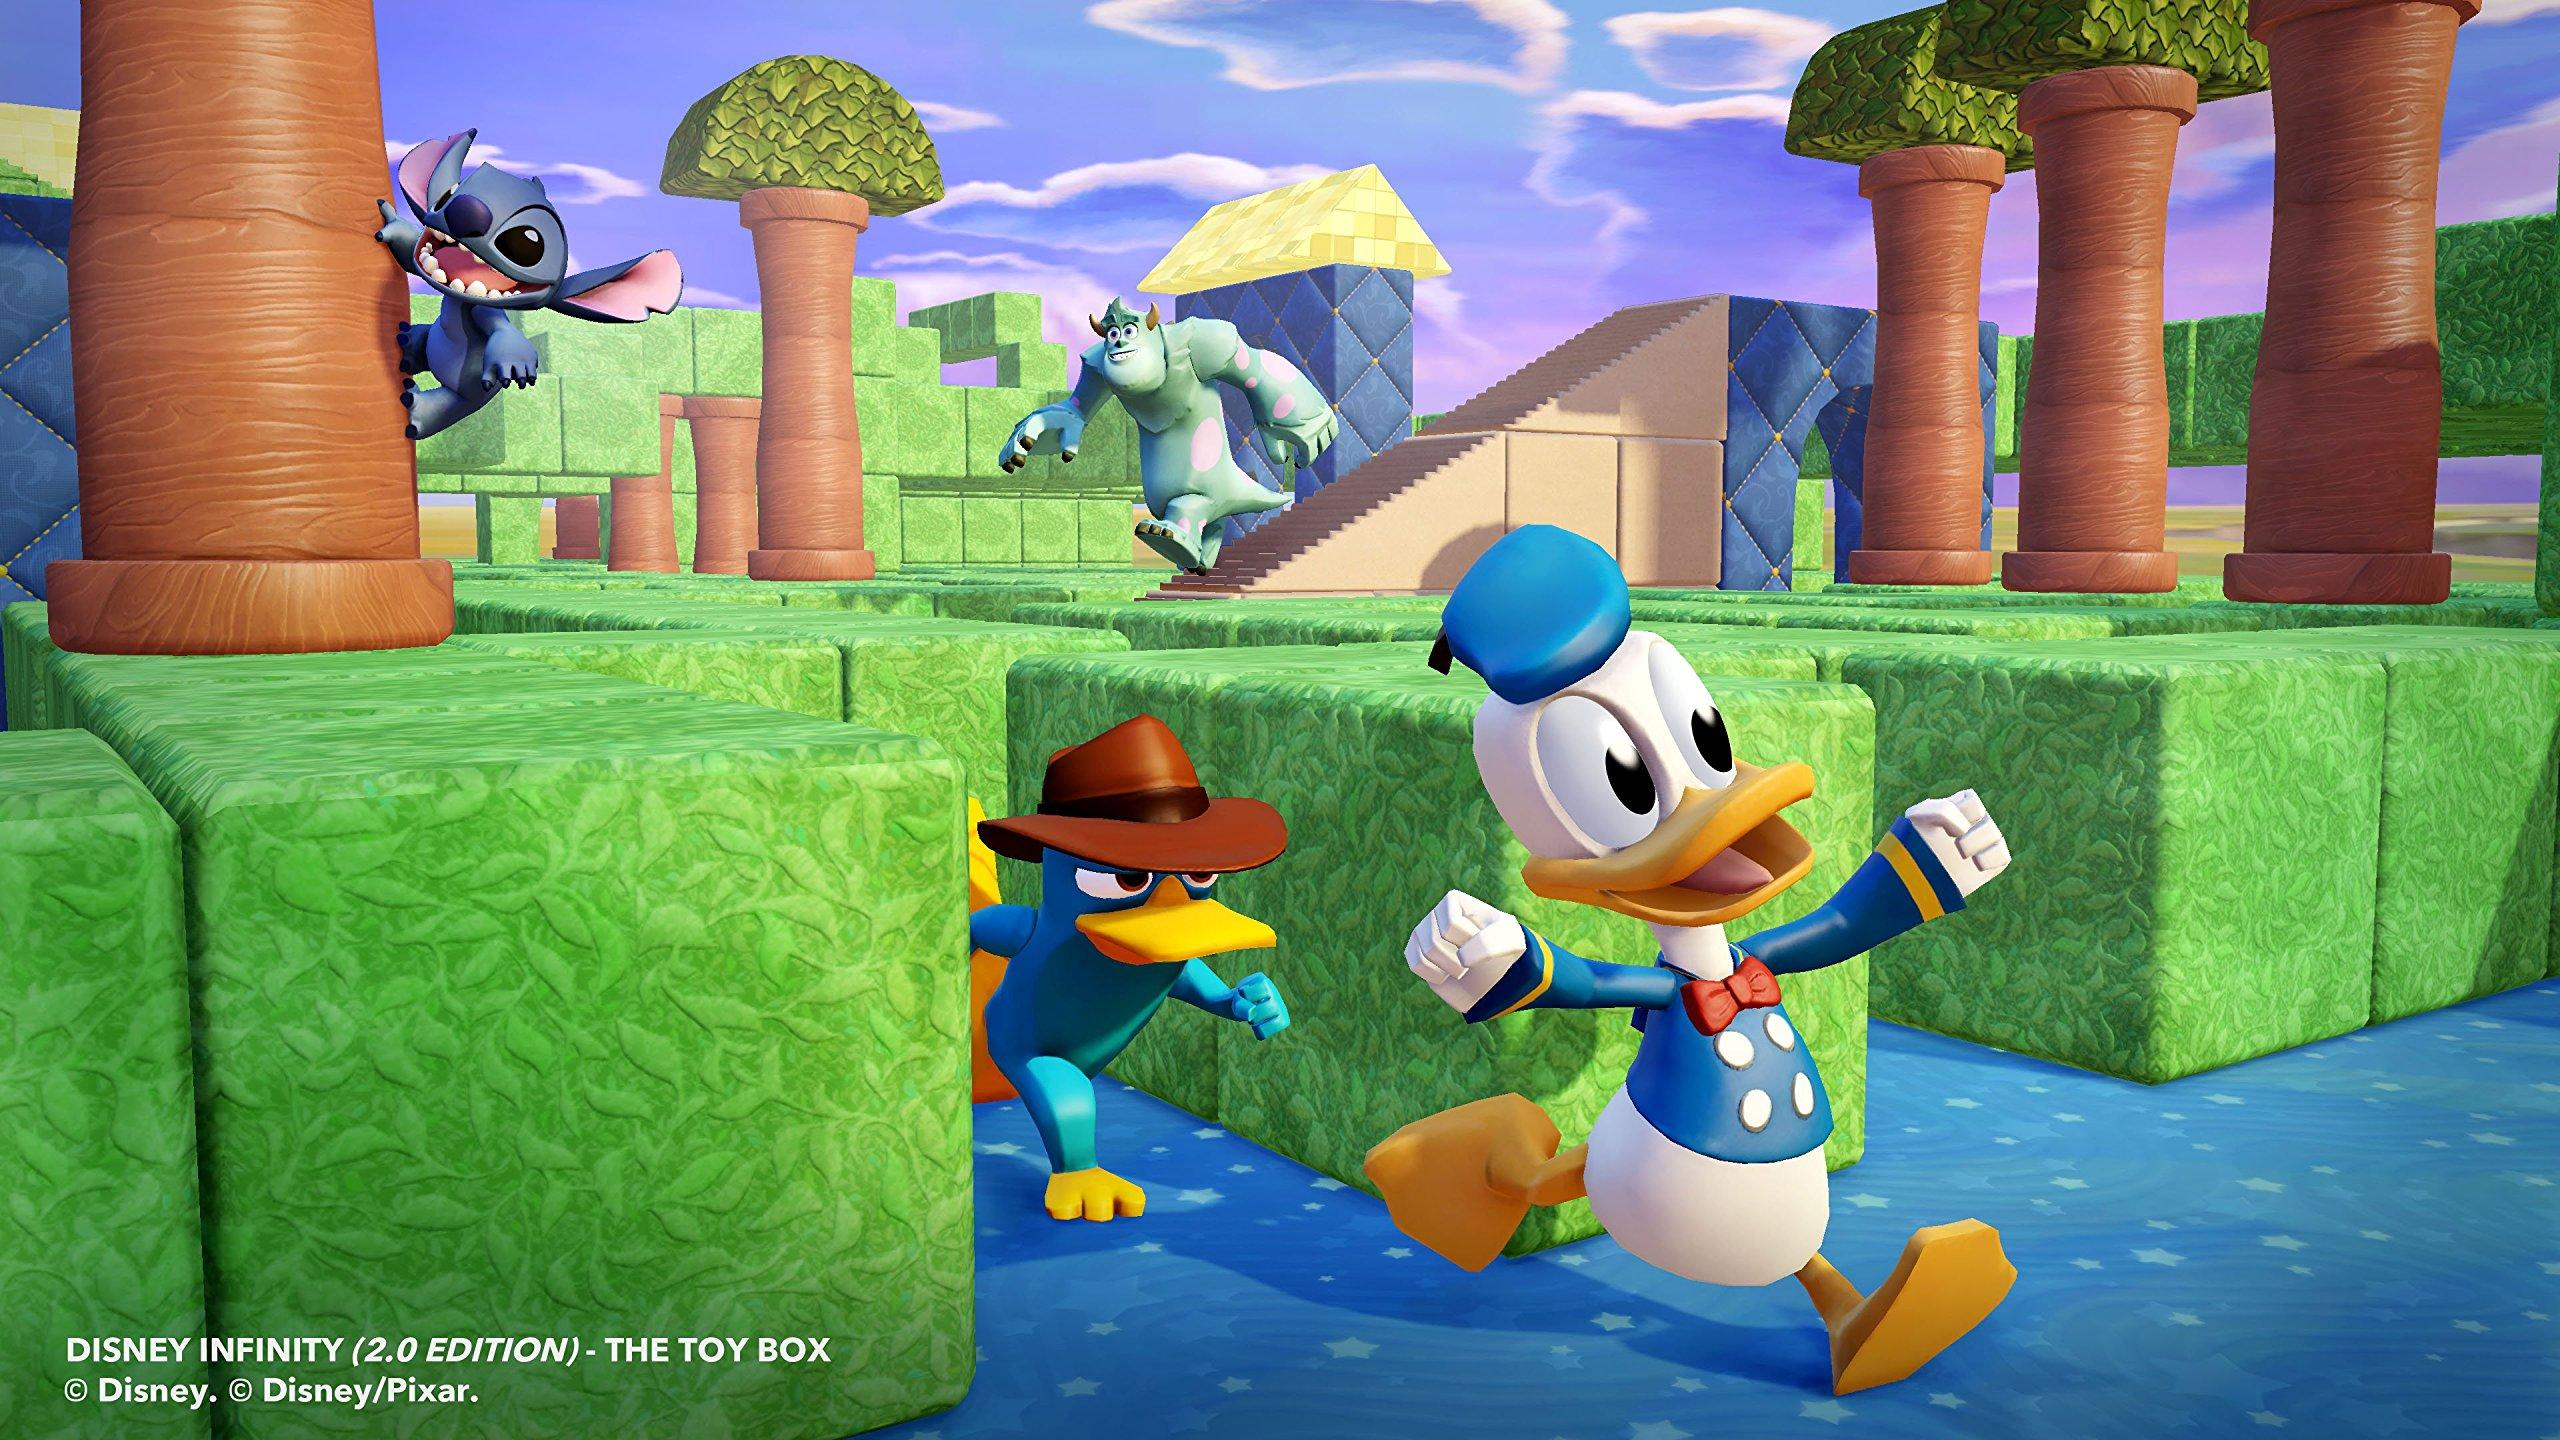 Disney Infinity: Disney Originals (2.0 Edition) Donald Duck Figure - Not Machine Specific by Disney Infinity (Image #12)